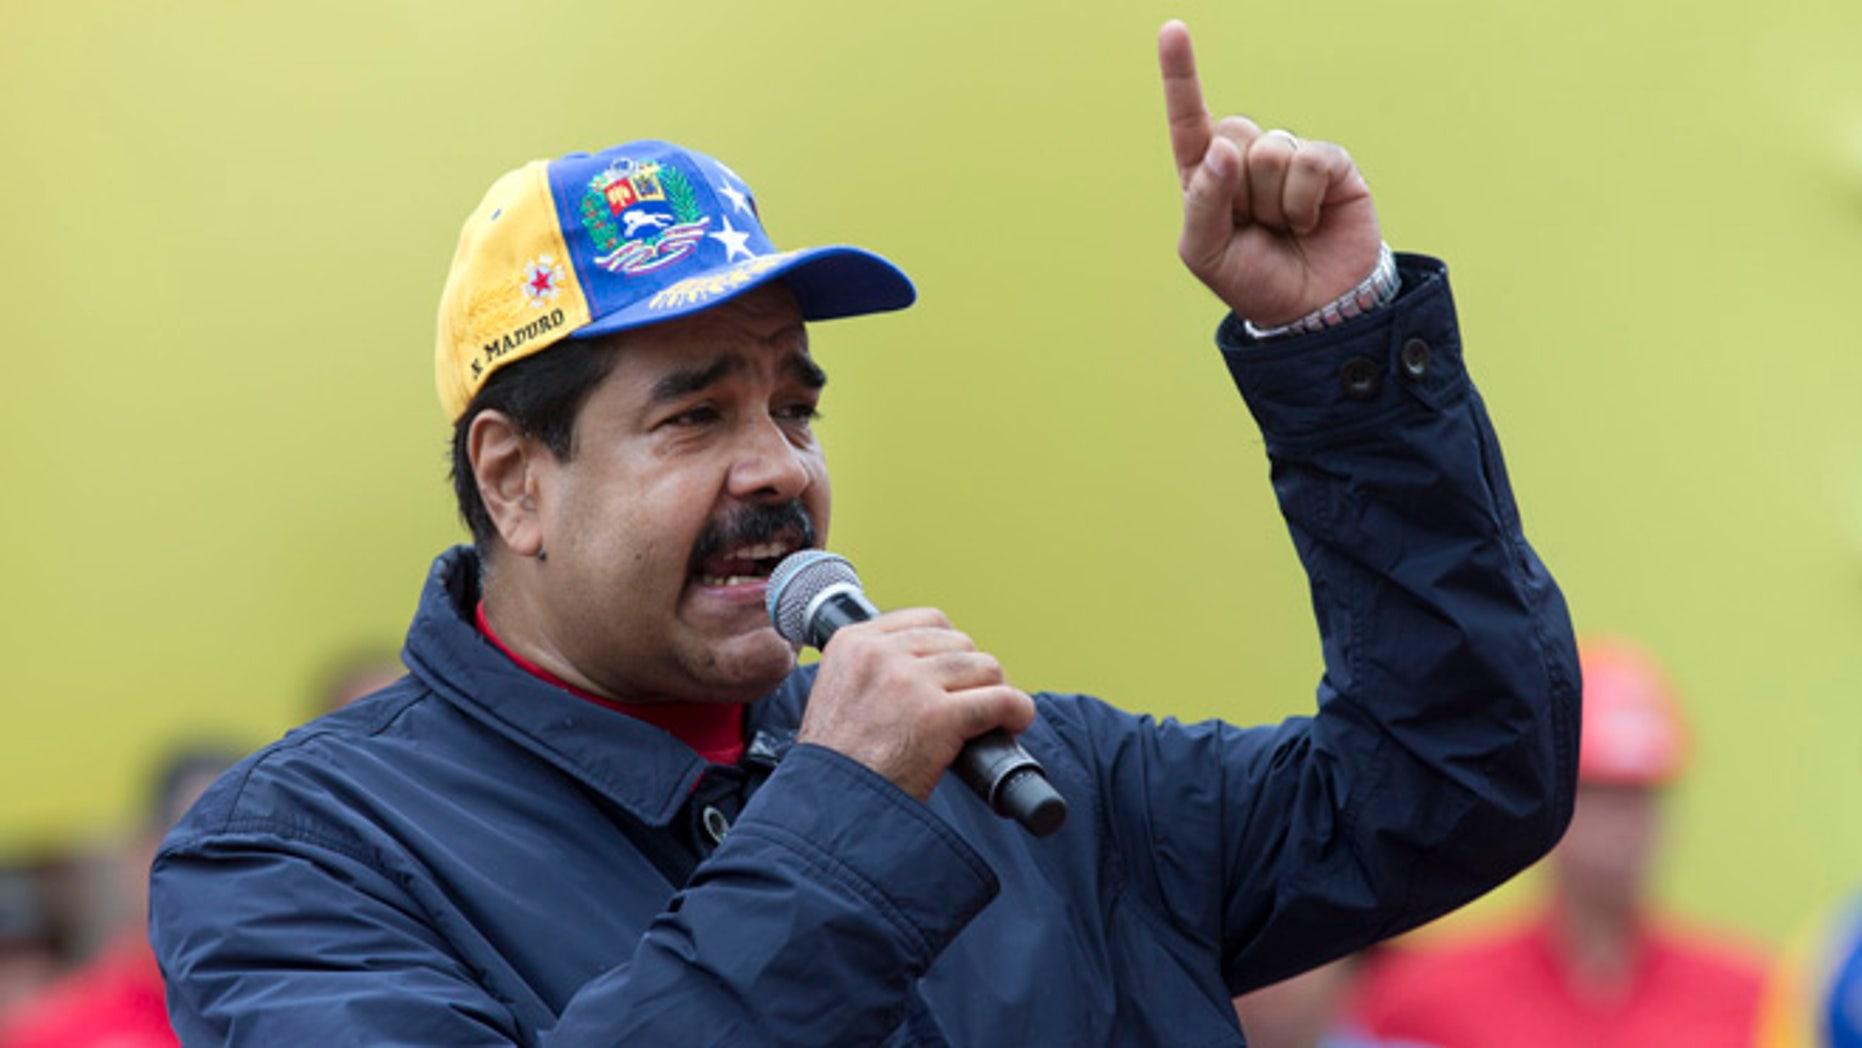 Venezuela's President Nicolas Maduro speaks during a May Day march in Caracas, Venezuela, Sunday, May 1, 2016.